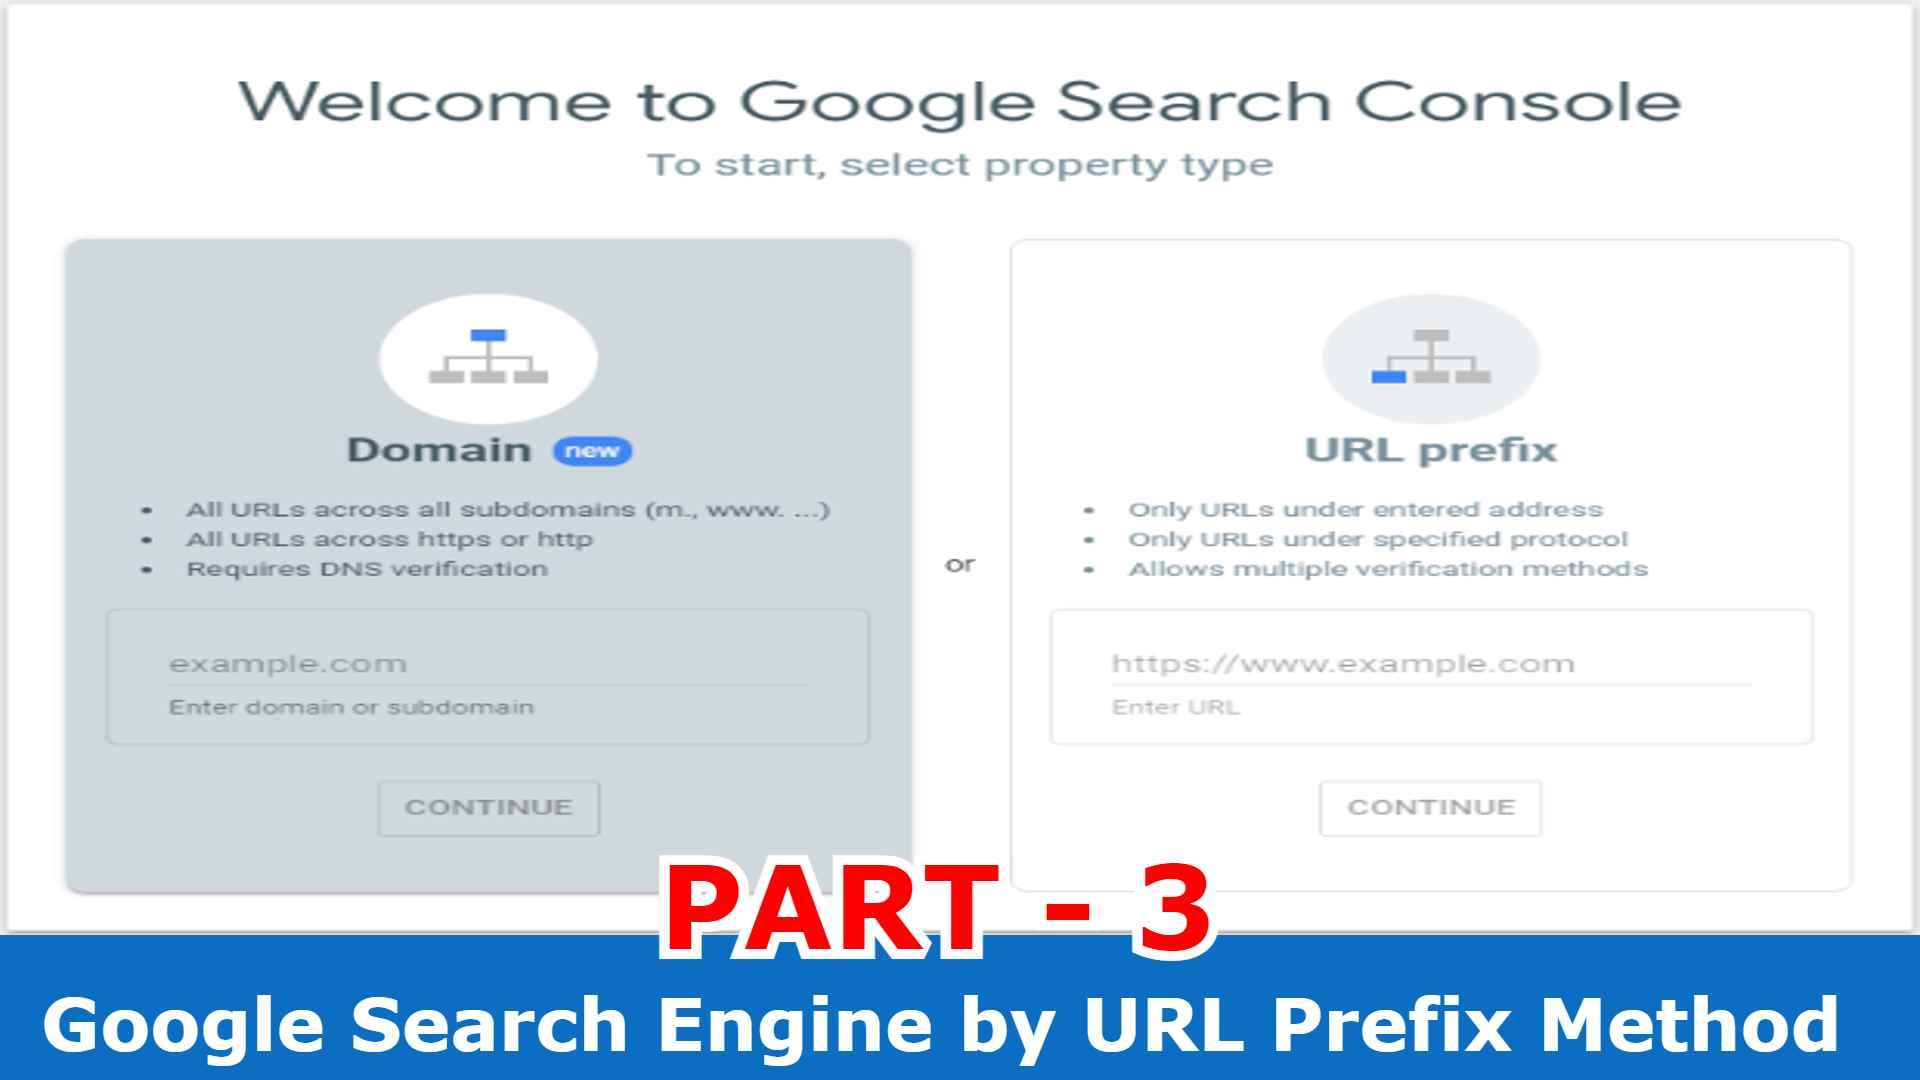 Google Search Engine by URL Prefix Method